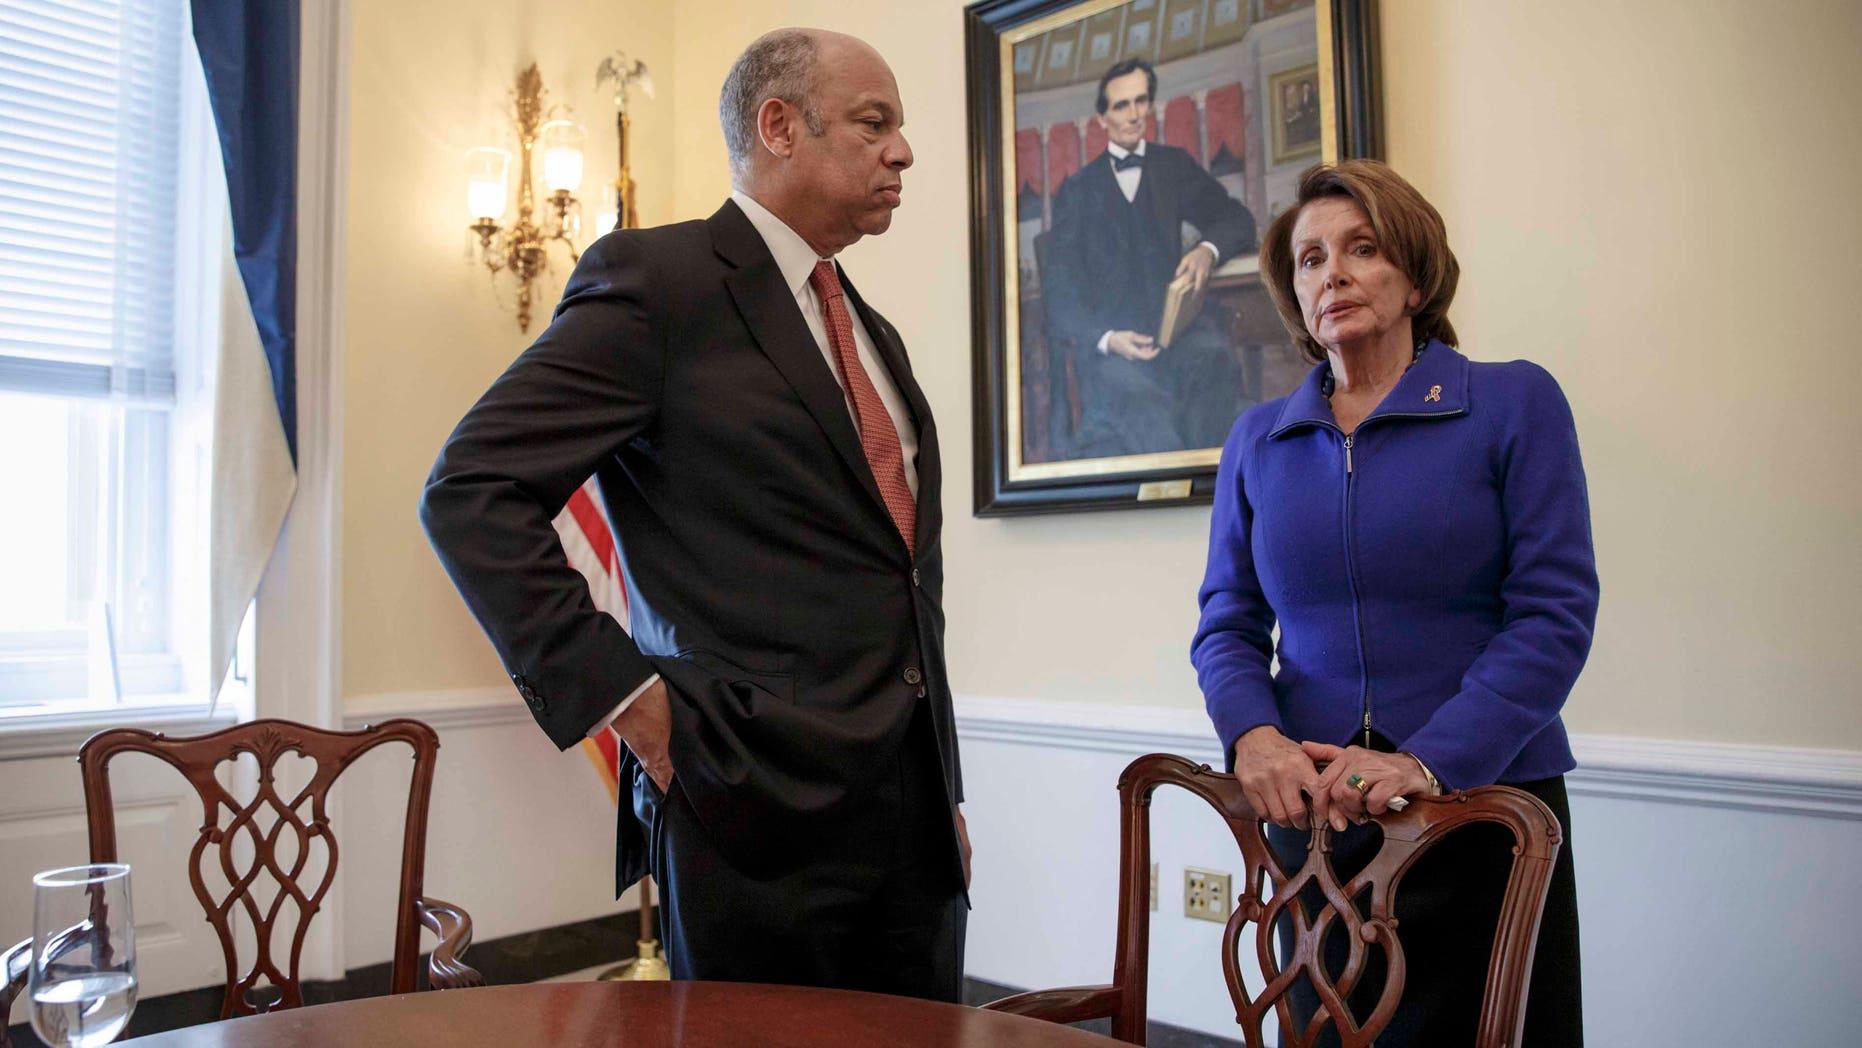 Homeland Security Secretary Jeh Johnson, left, meets with House Minority Leader Nancy Pelosi, D-Calif.